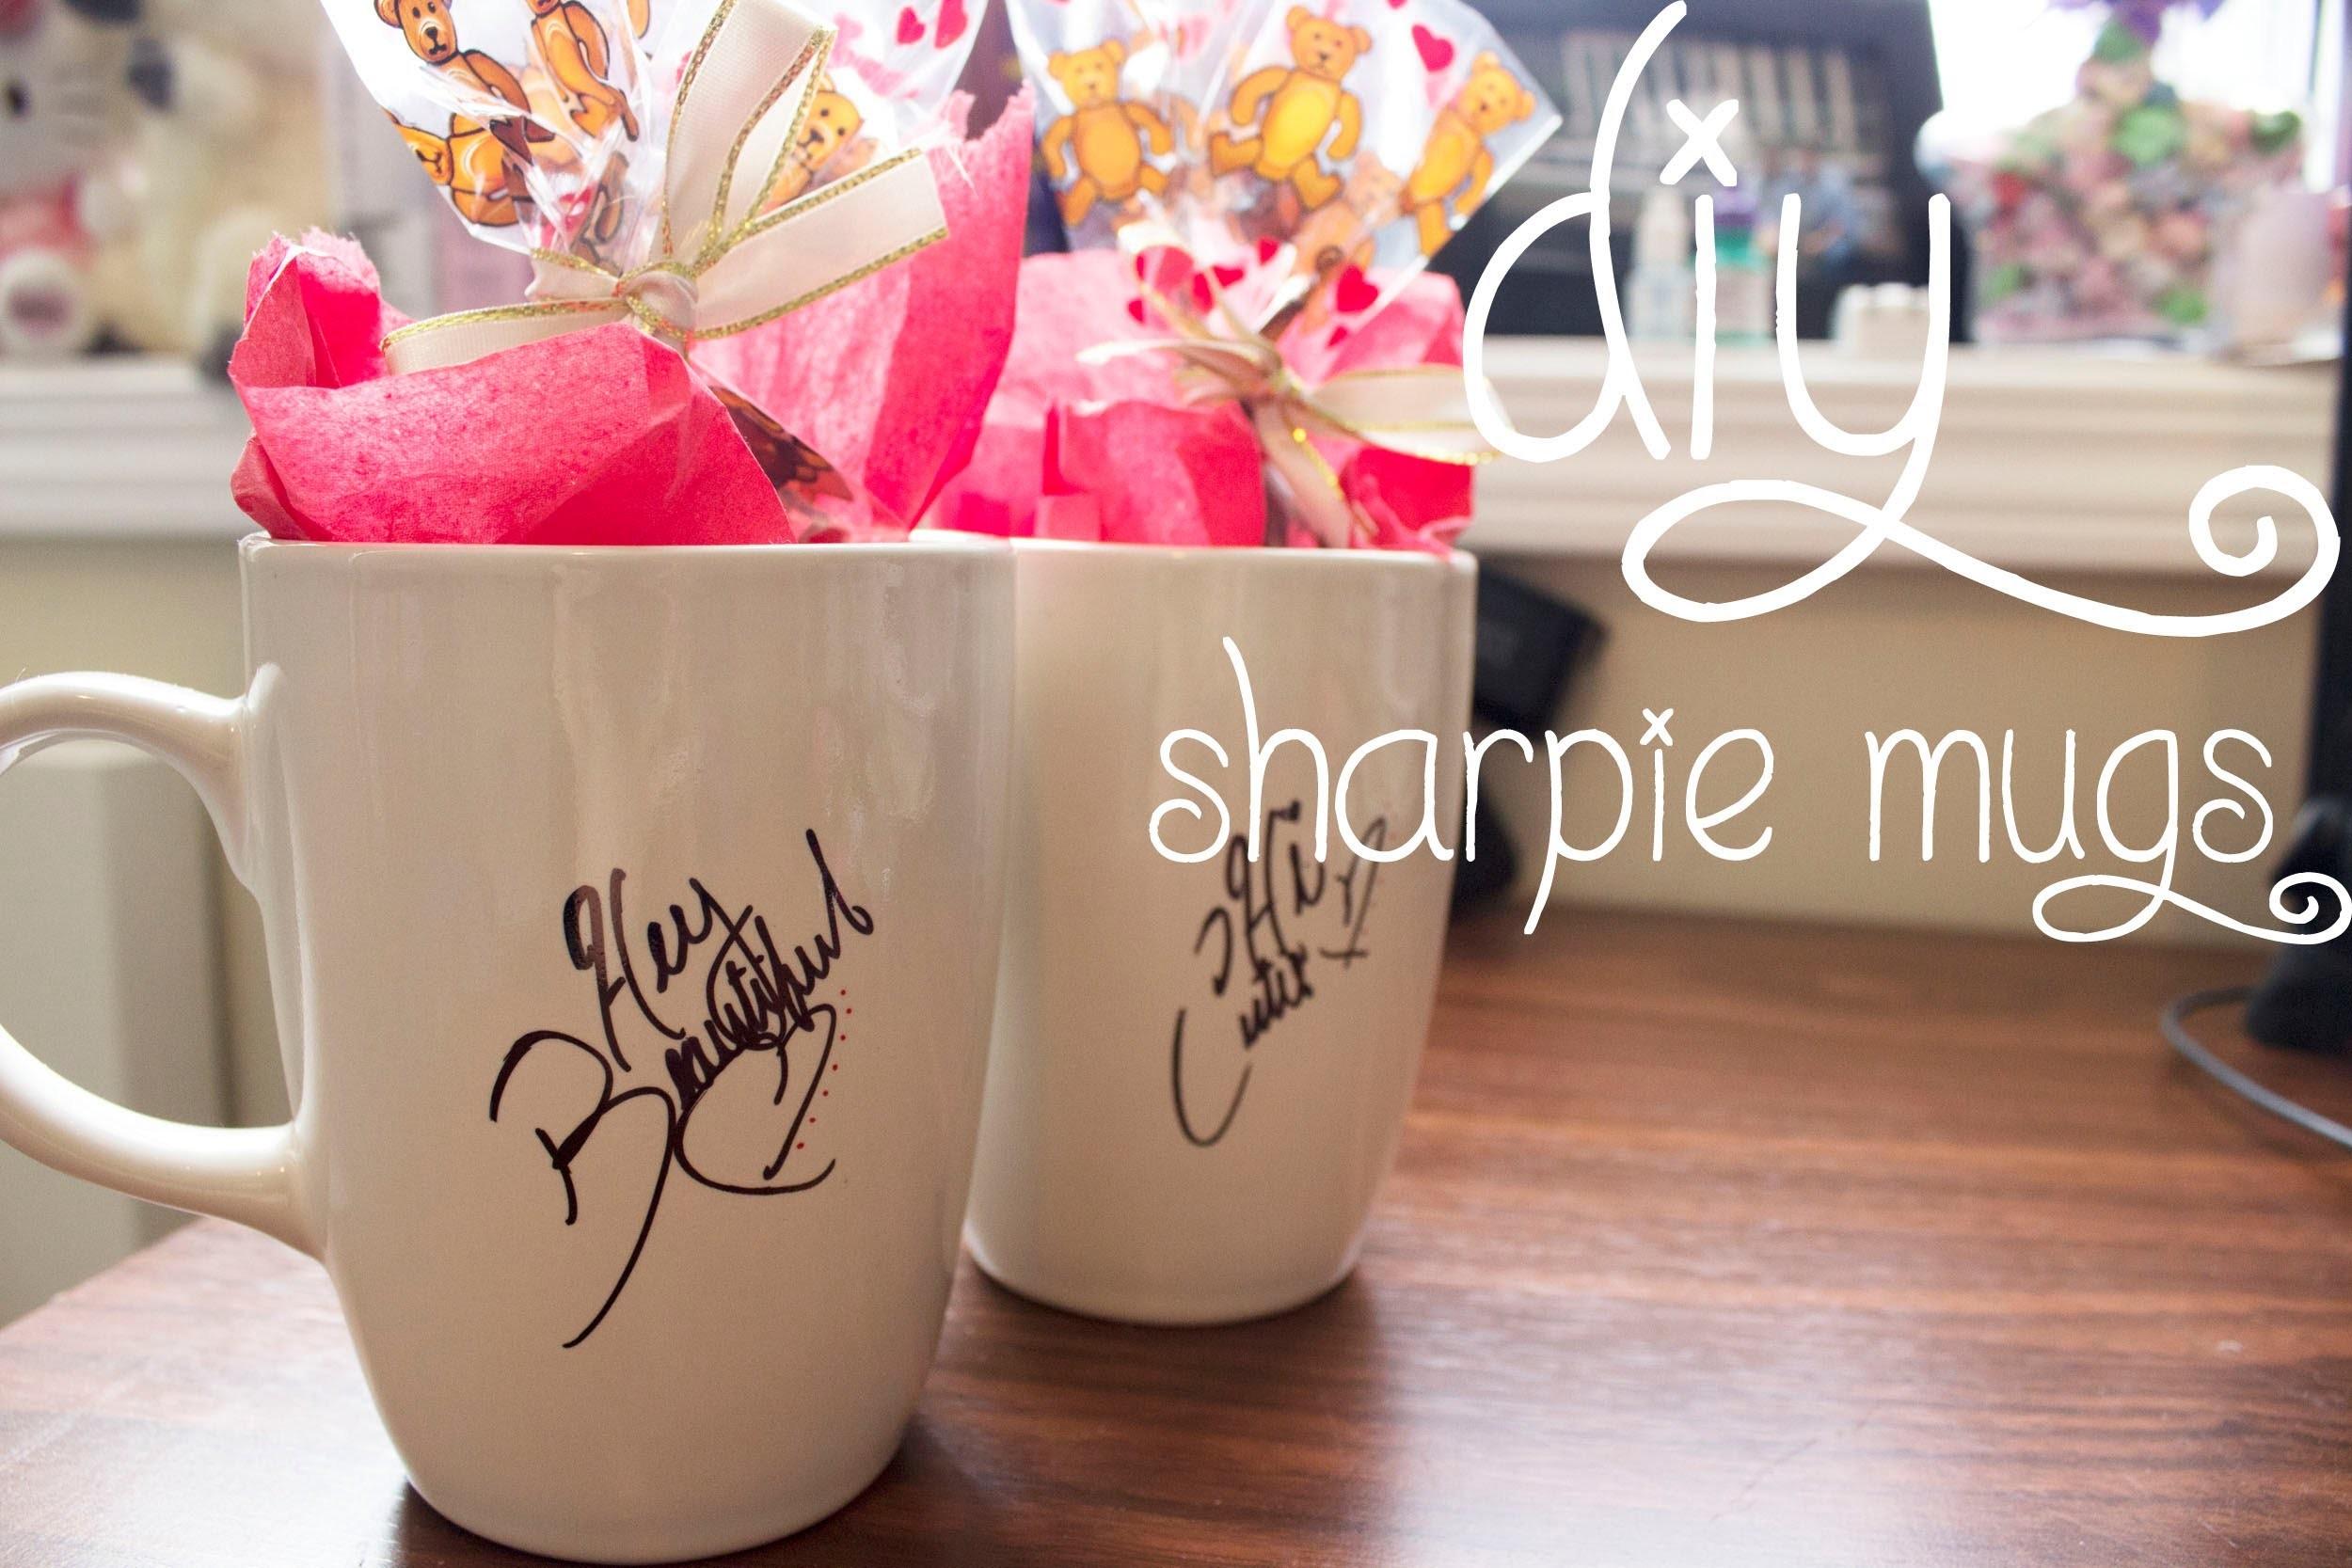 14 Days of Valentine (Day 5): DIY Sharpie Mugs